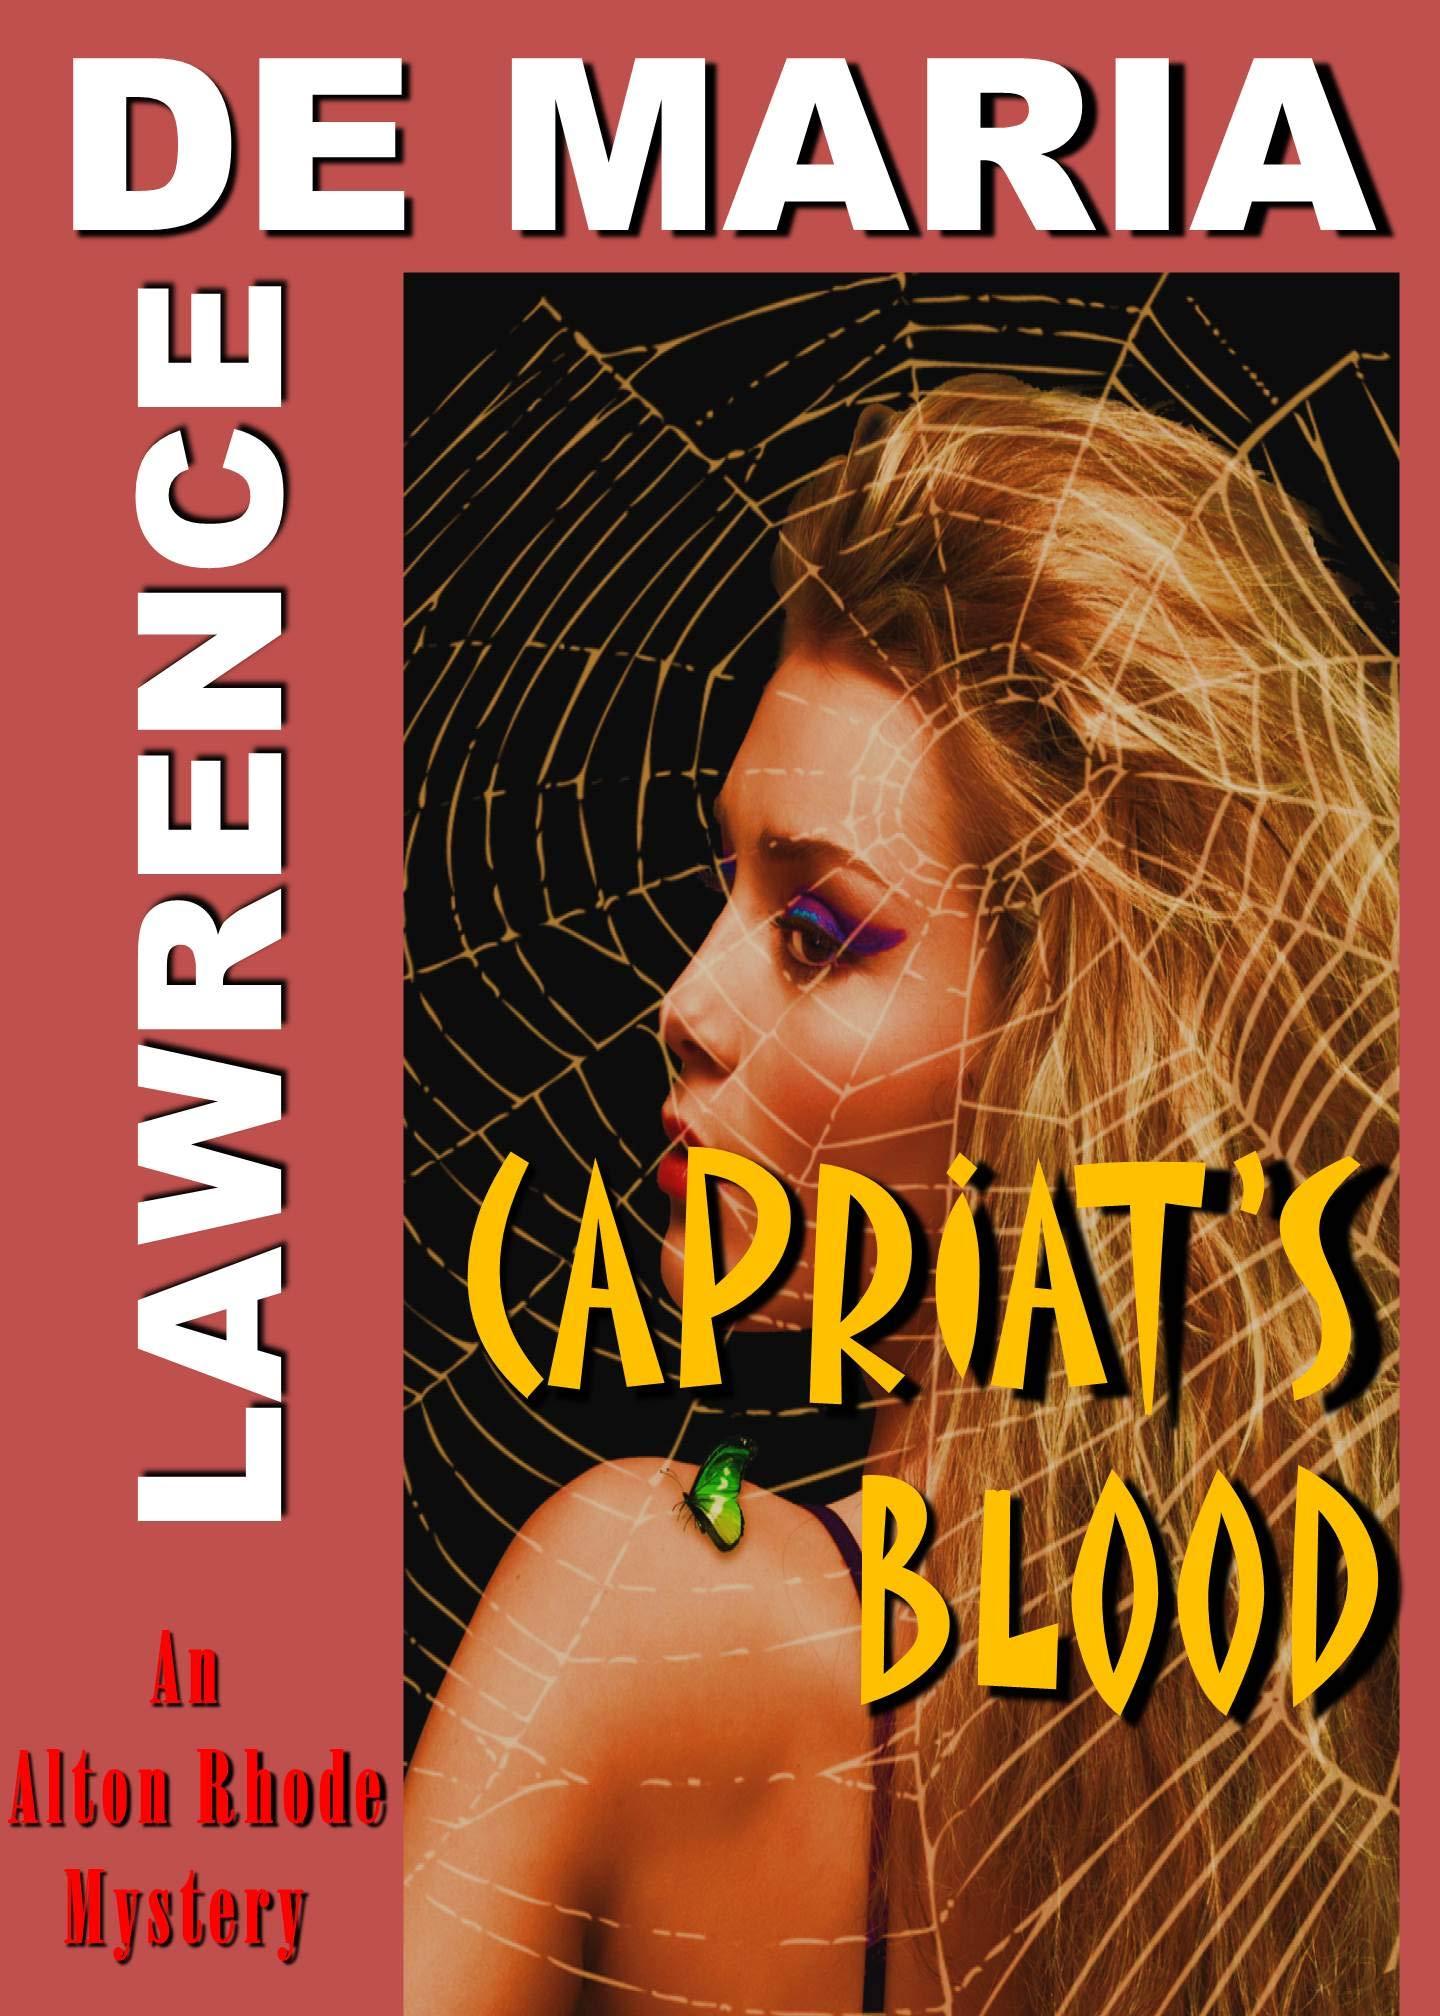 CAPRIATI'S BLOOD: An Alton Rhode Mystery (ALTON RHODE MYSTERIES Book 1)